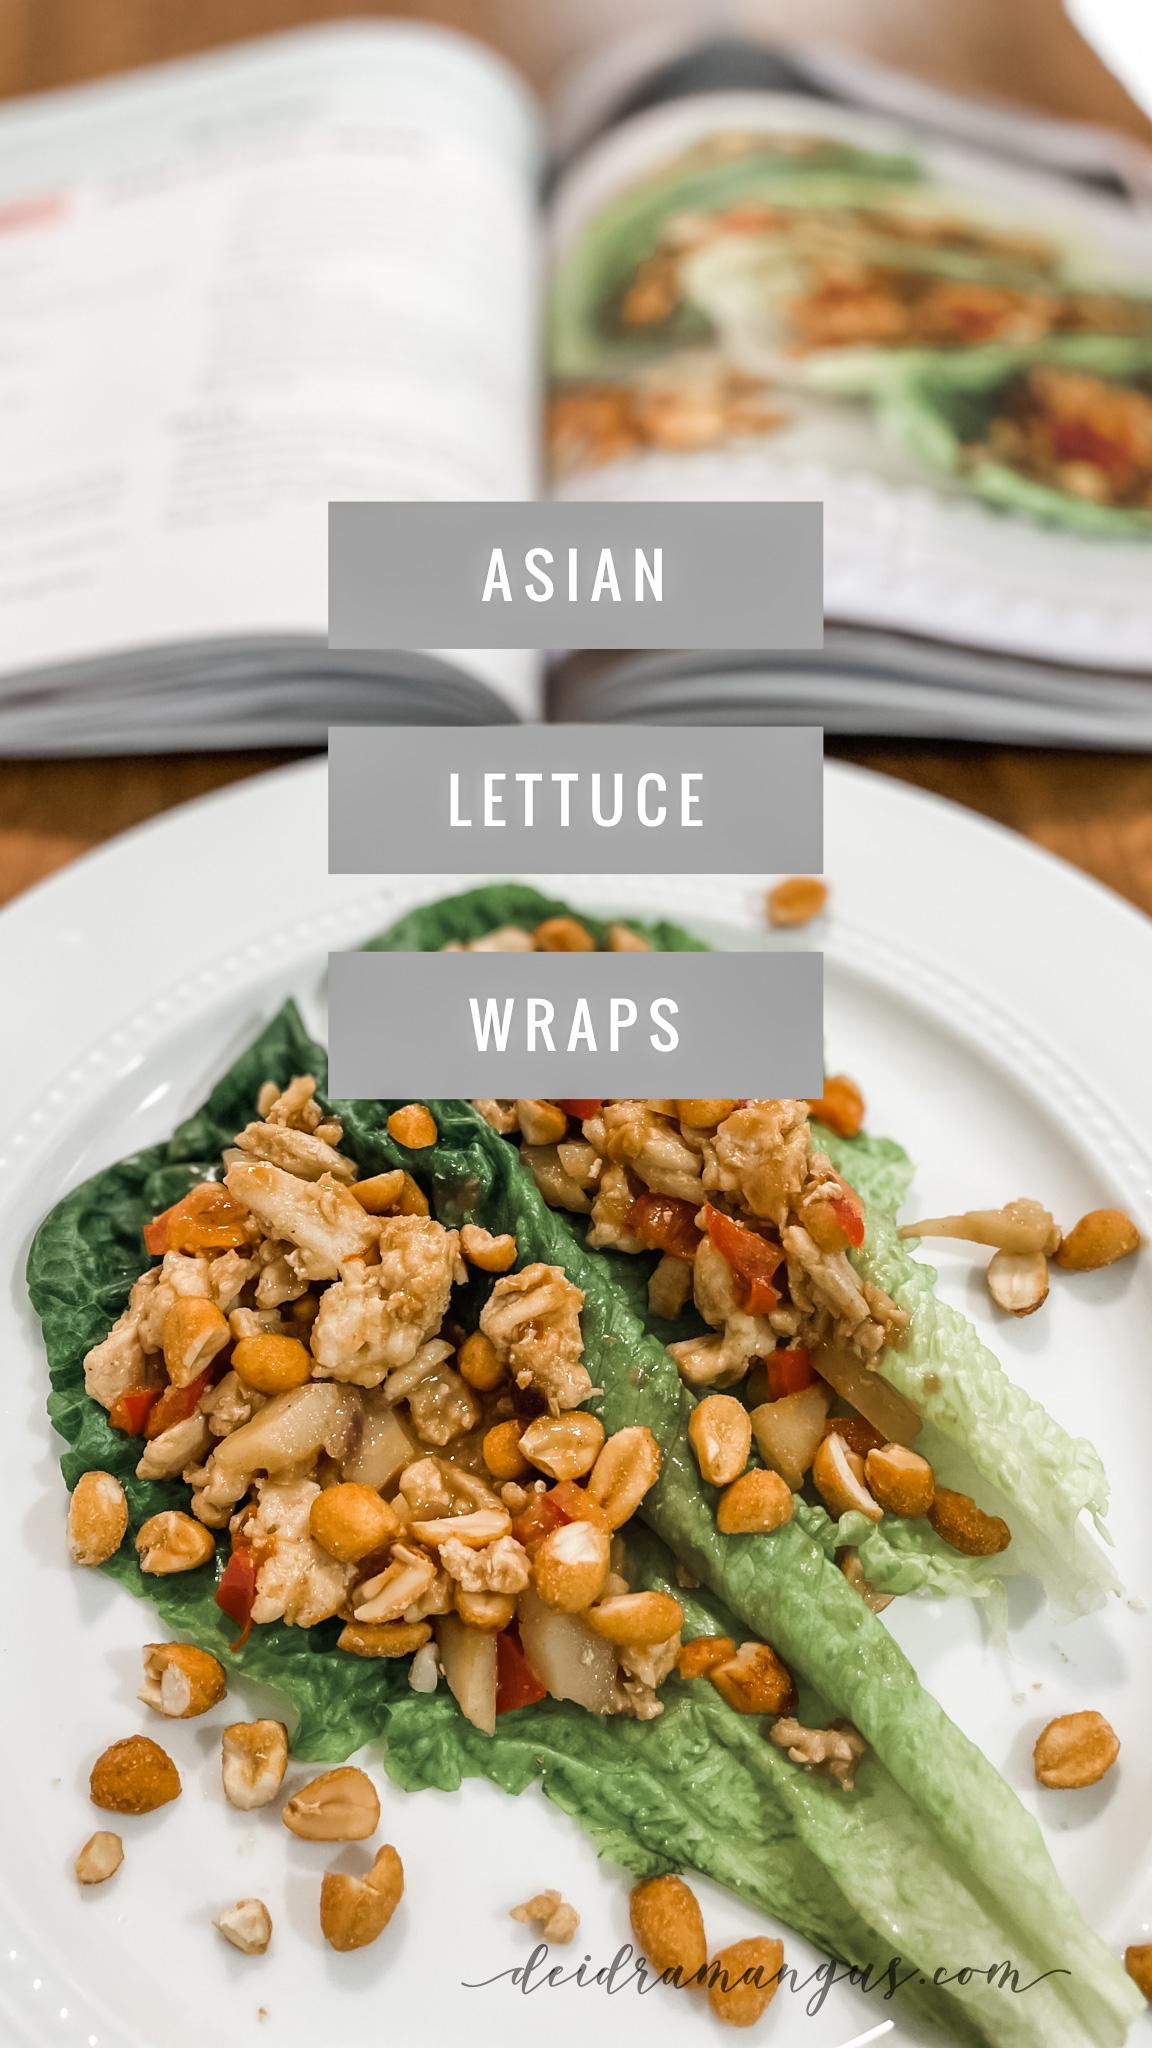 Deidra Mangus, Asian lettuce wraps, healthy lettuce wraps, peanut sauce, thai recipes, healthy appetizer recipes, healthy lunch recipes, forever fit cookbook, healthy cookbook and devotional, beachbody coach and author of cookbook